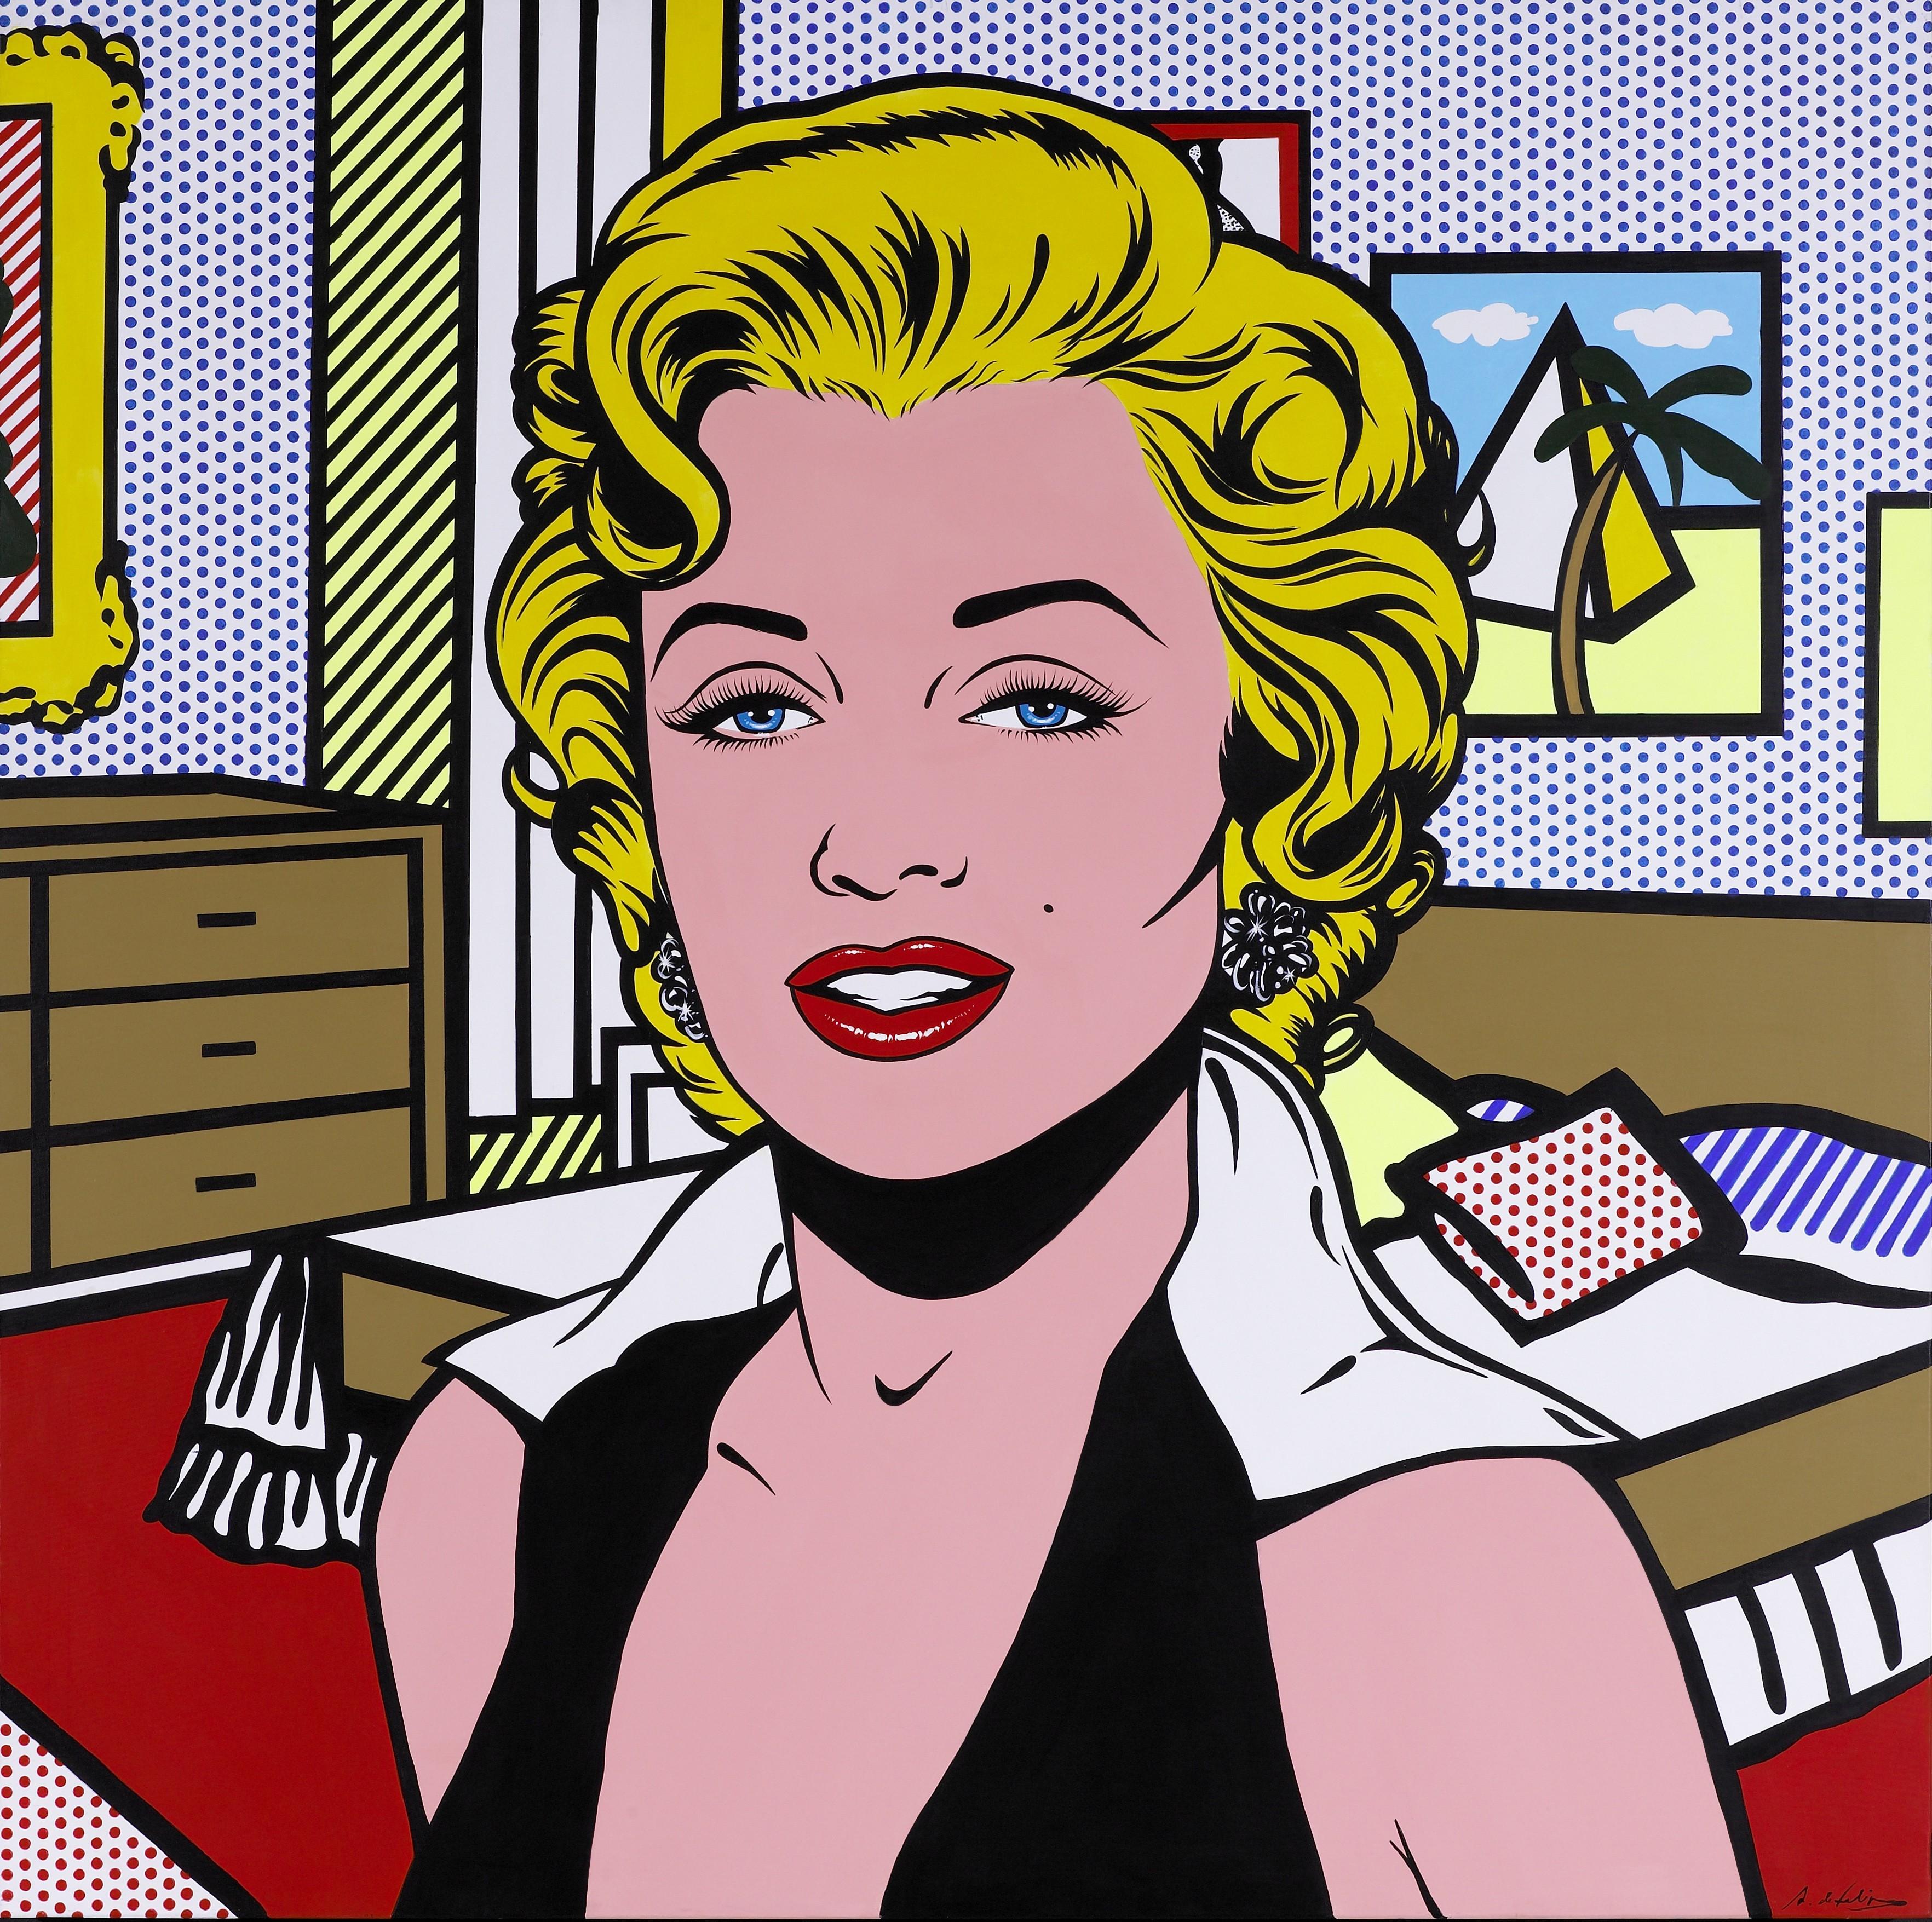 General 3528x3510 vintage Marilyn Monroe women artwork pop art